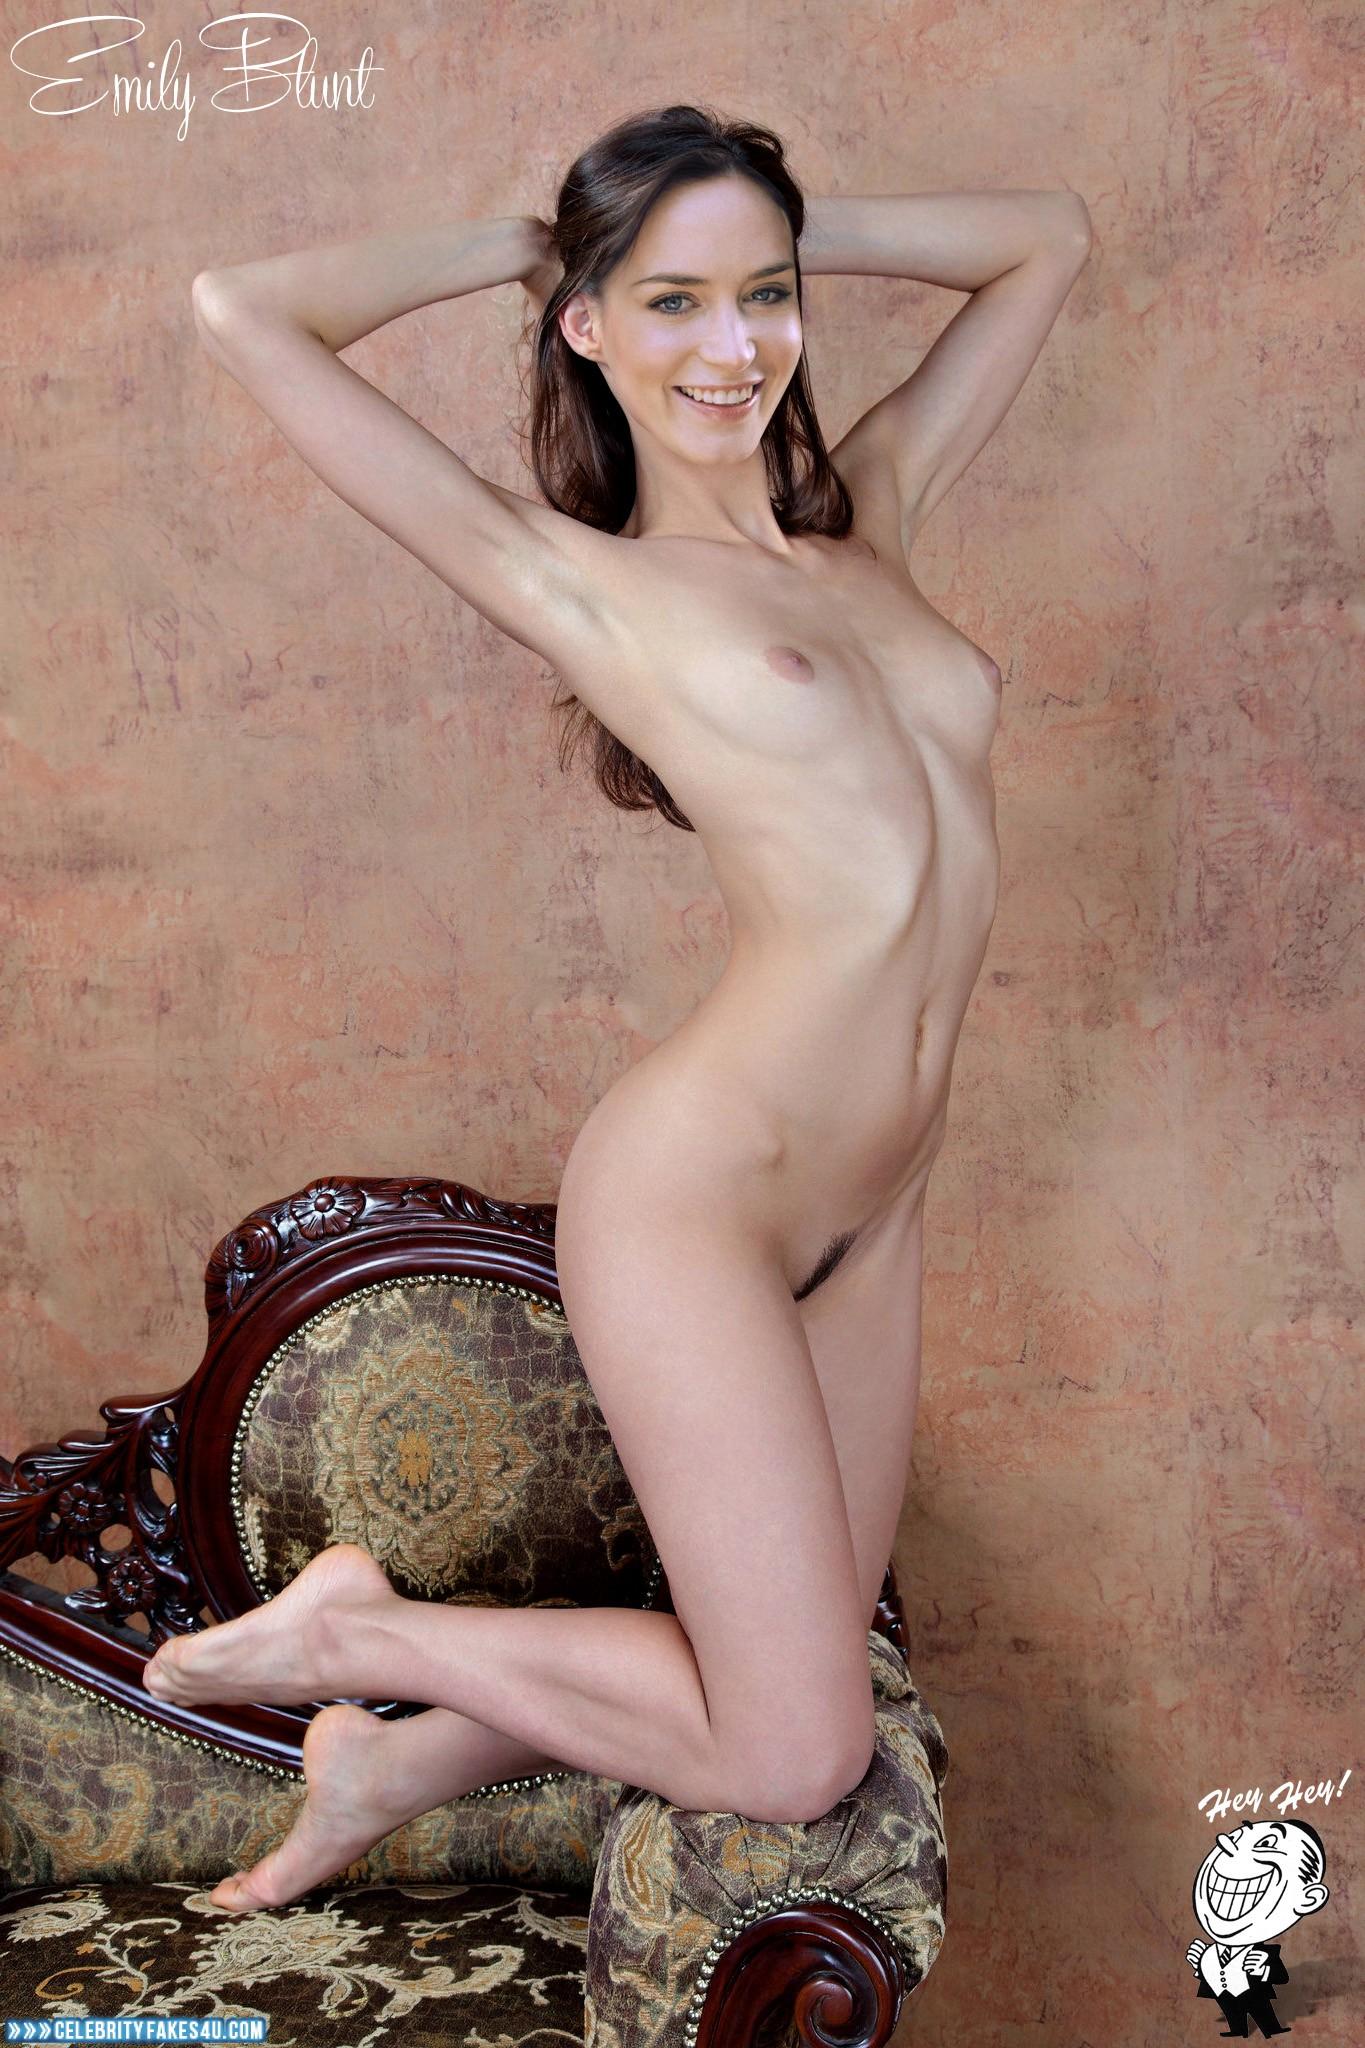 virgin-emily-blunt-nudes